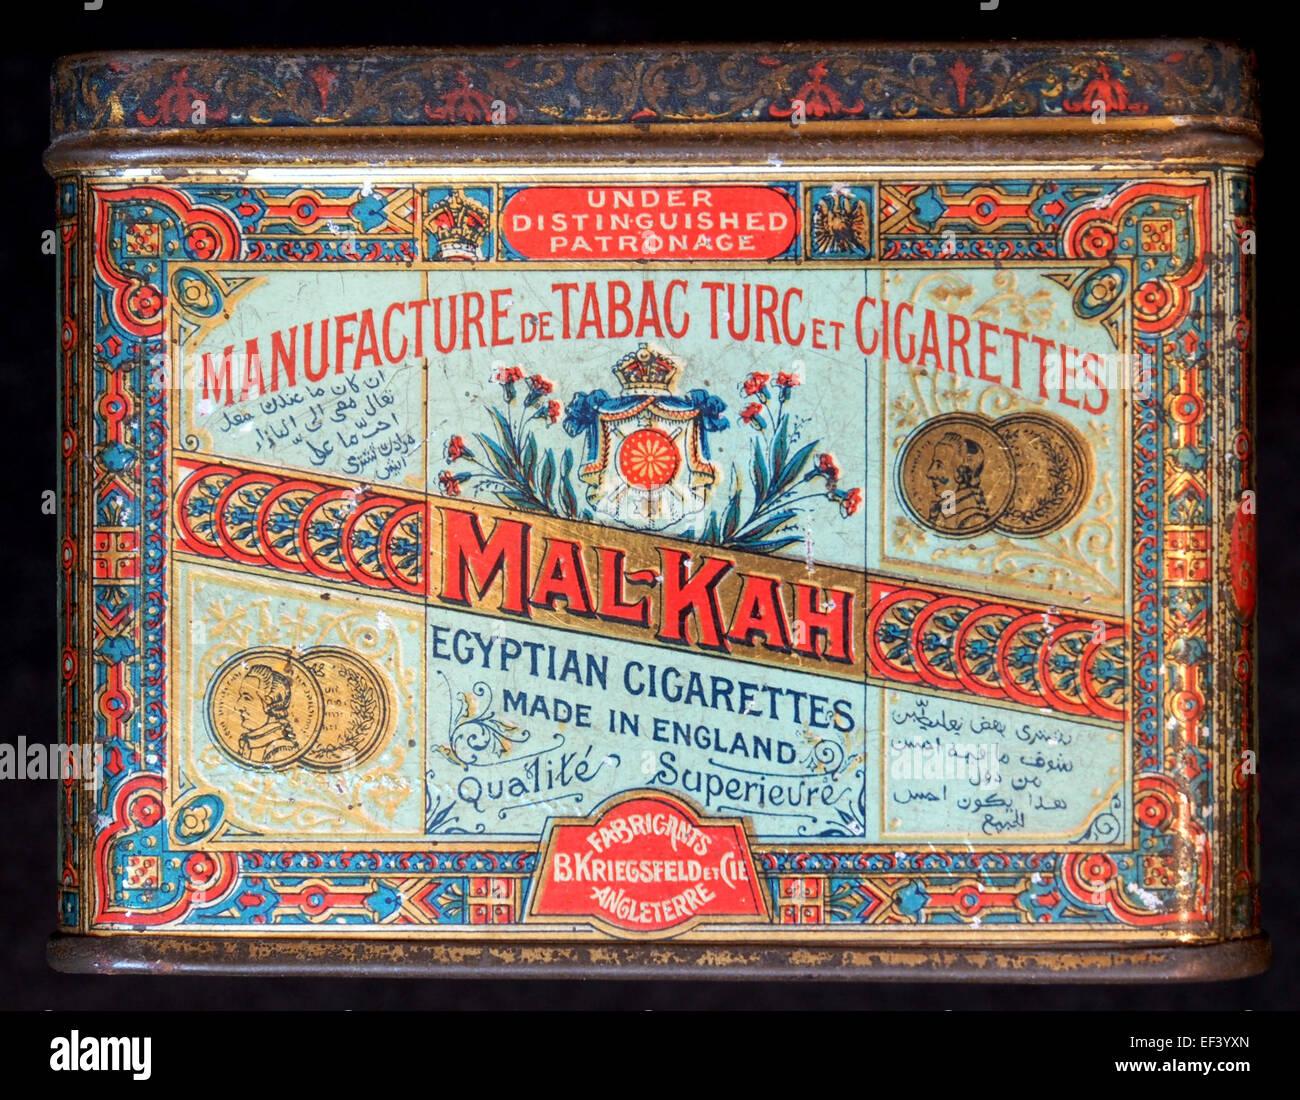 Mal-Kah sigarettes tin Photo Stock